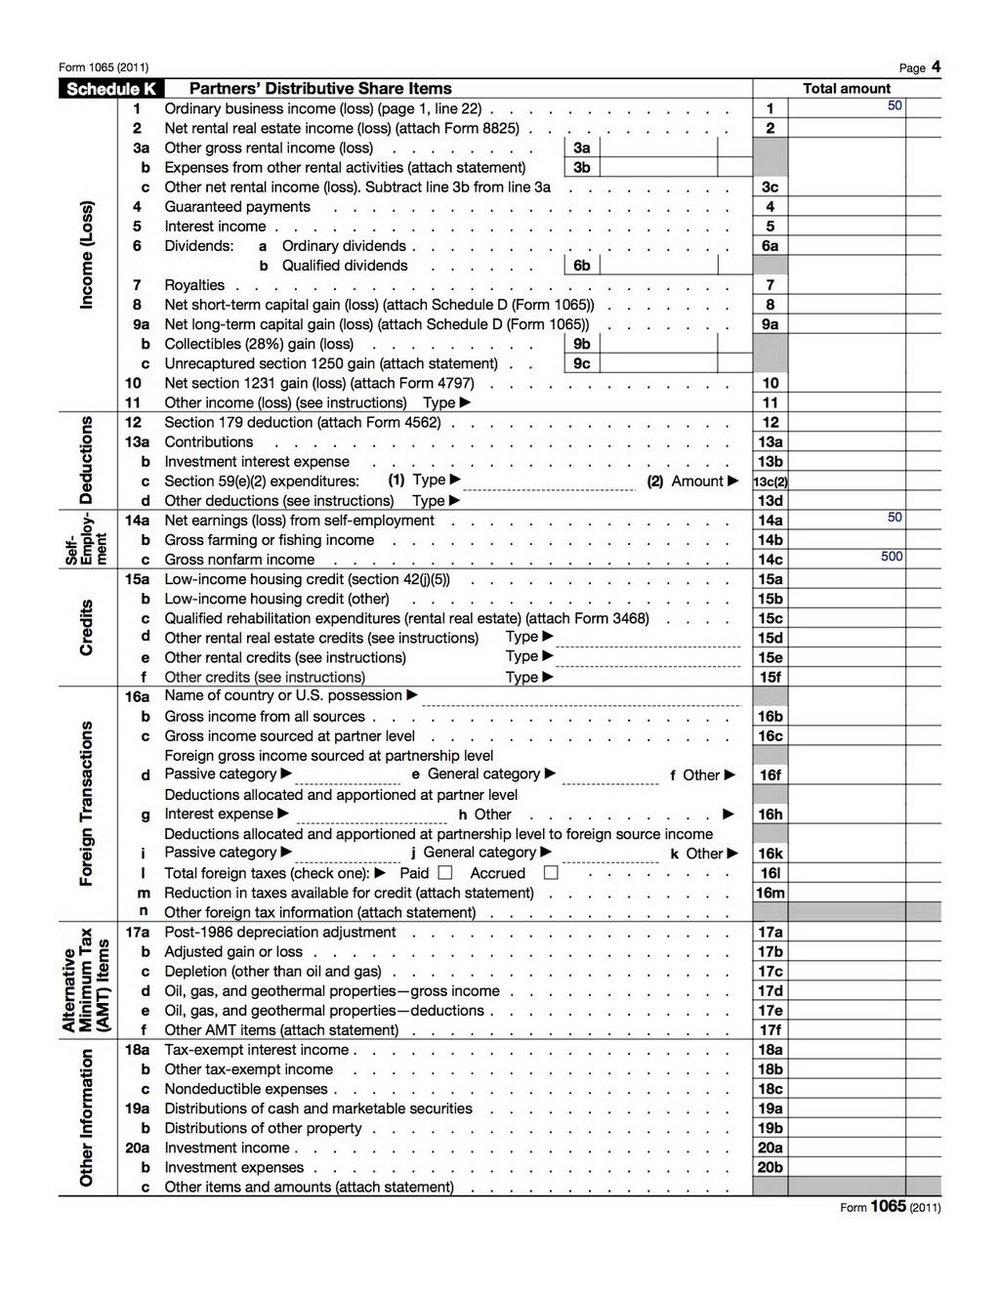 Form 1065 Online Preparation